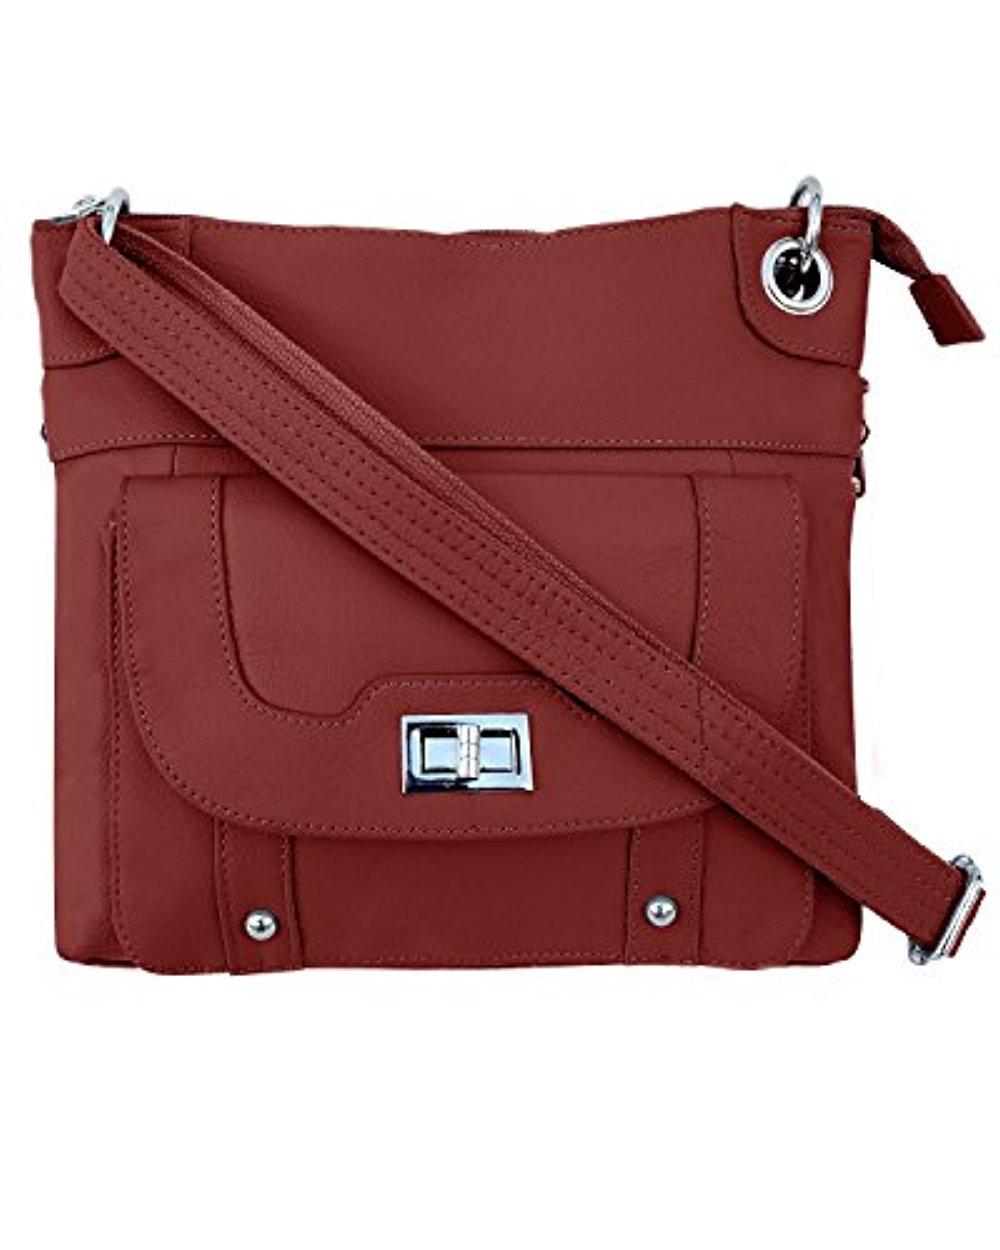 Ladies' Gun Concealment Crossbody Bag Red